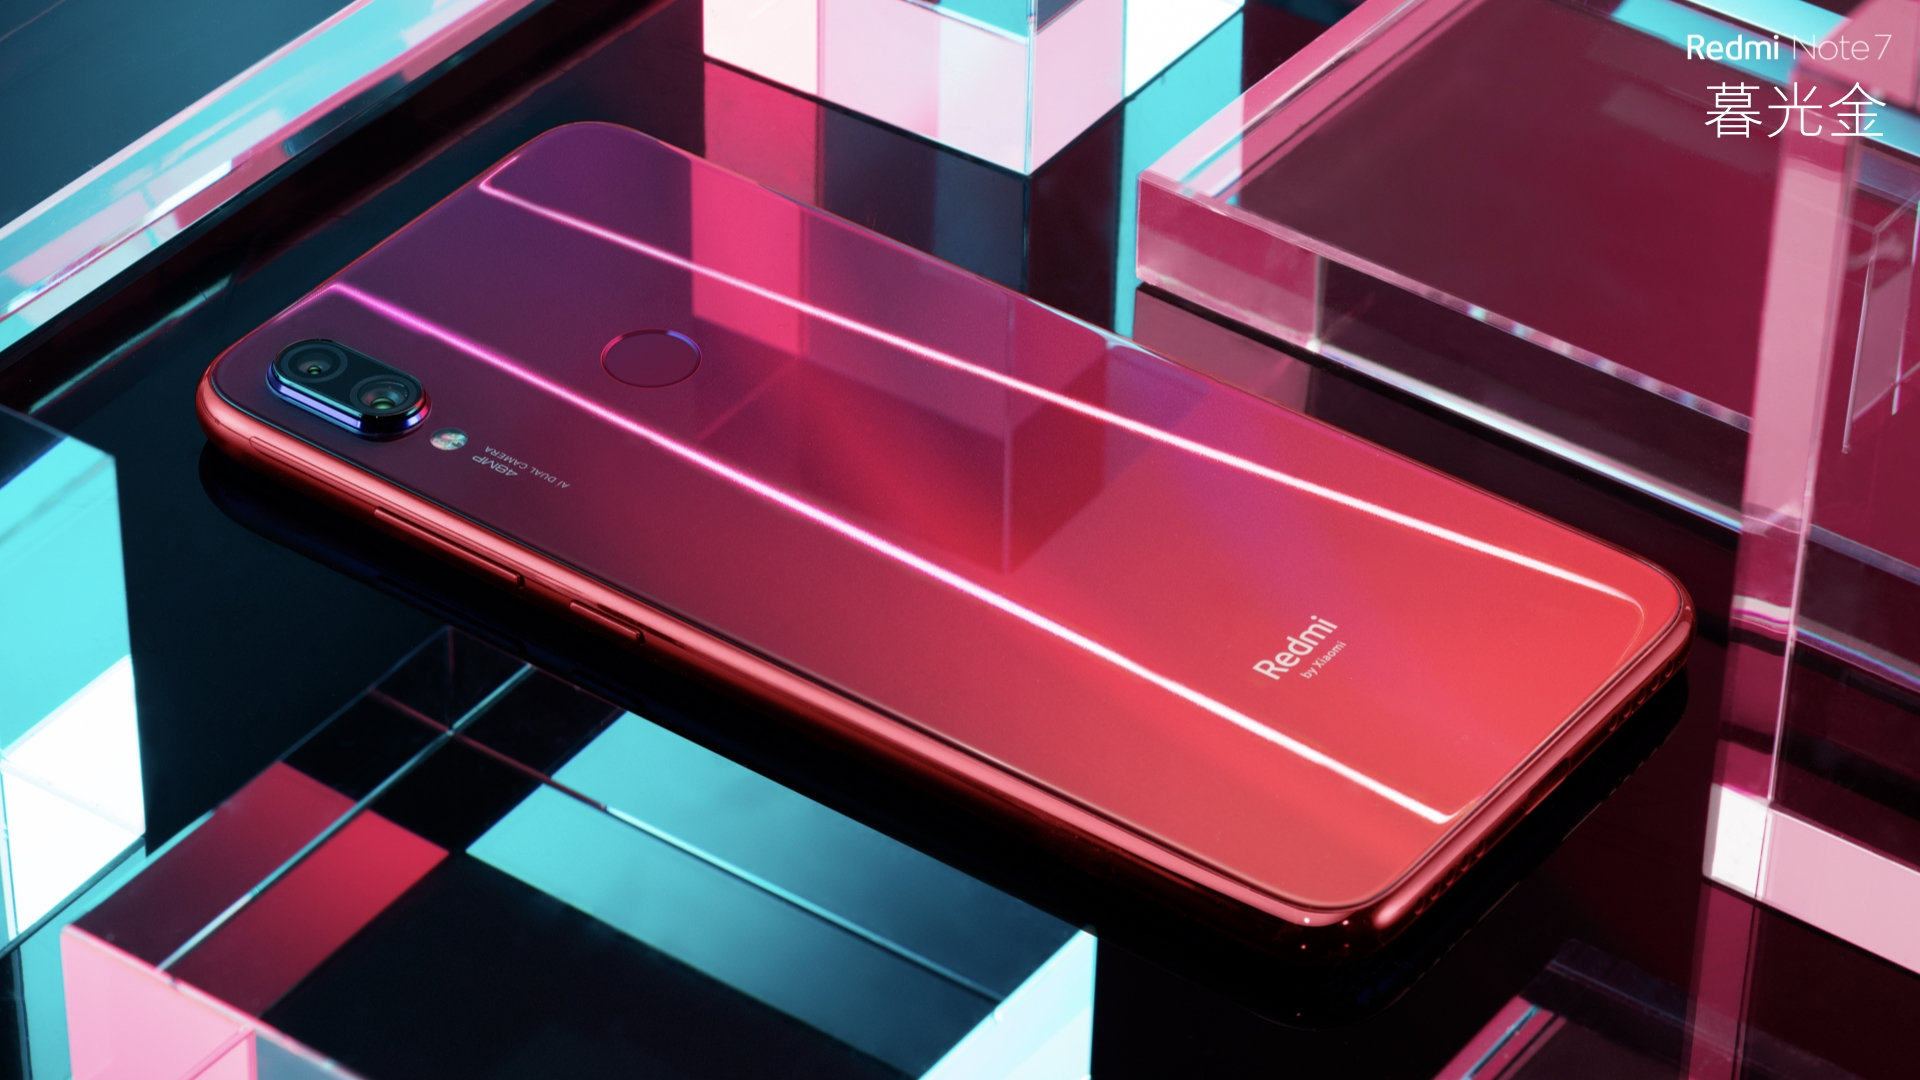 Řada Redmi od Xiaomi nabídne telefon se Snapdragonem 855